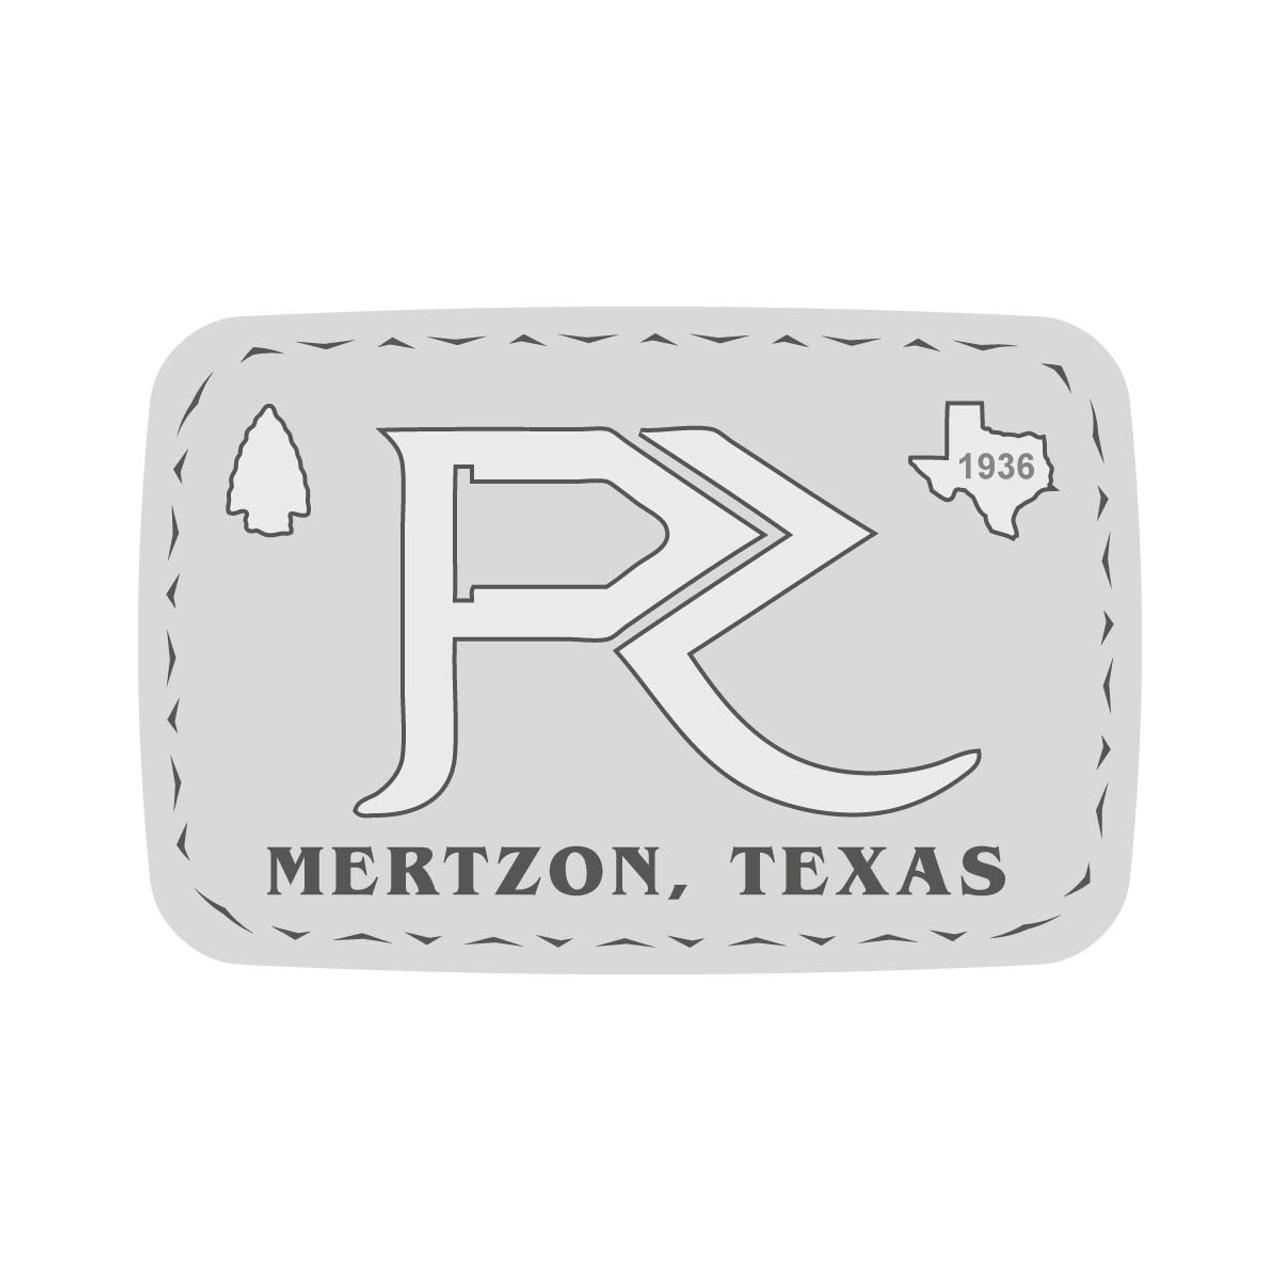 Pleasant Rock Ranch Mertzon Texas Buckle (RESTRICTED)